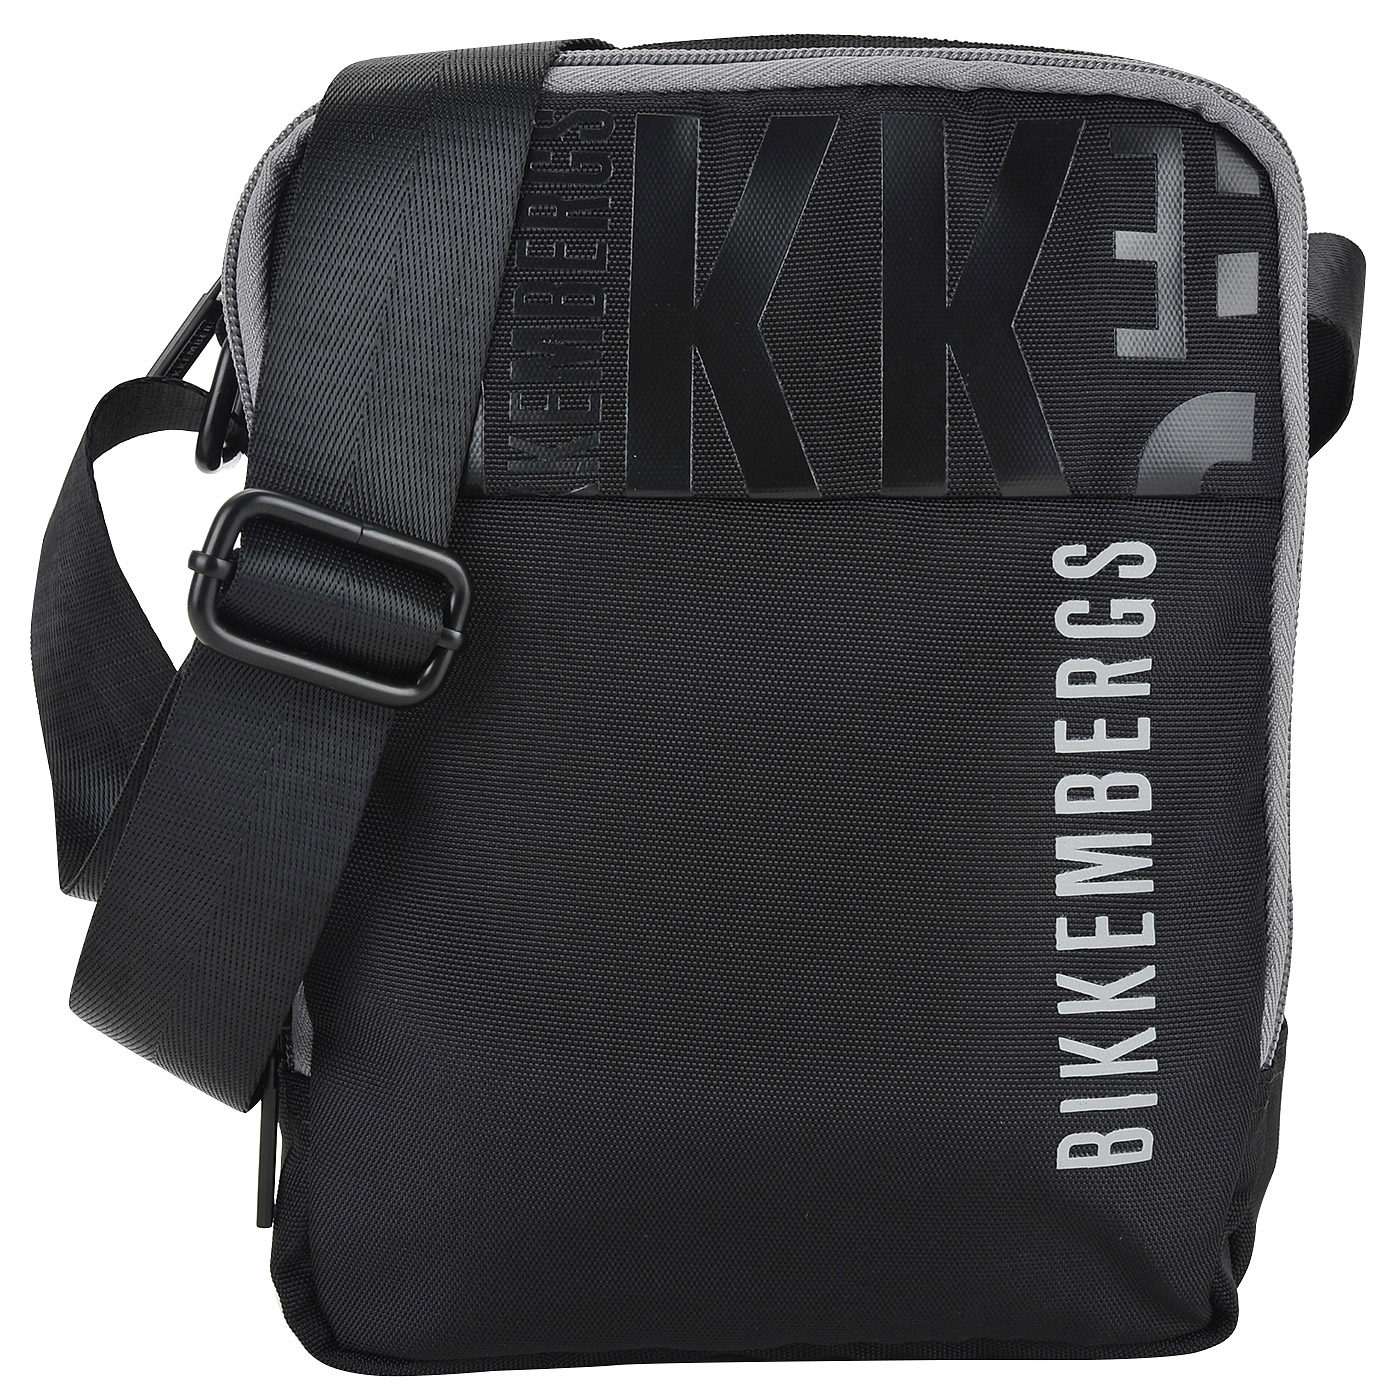 6db4b446b40f Мужская сумка через плечо Bikkembergs Мужская сумка через плечо Bikkembergs  ...